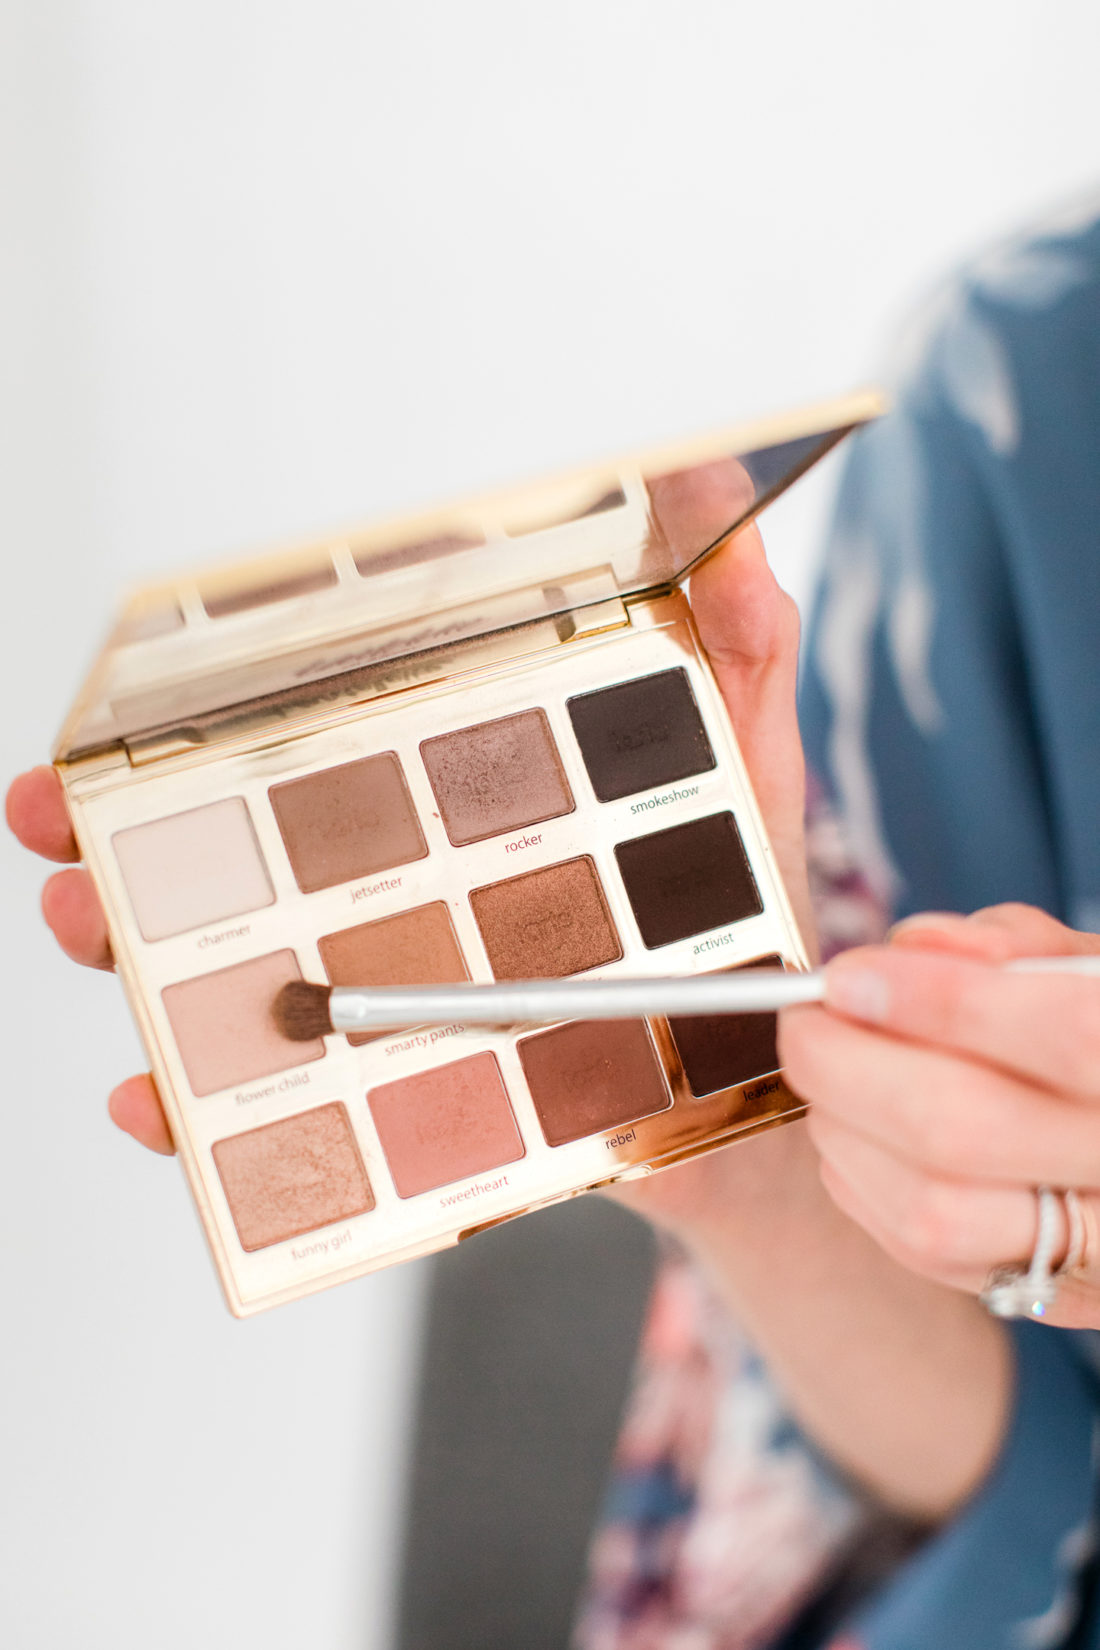 My photo shoot makeup look happily eva after eva amurri martino applies eye shadow as part of her photoshoot makeup tutorial baditri Images